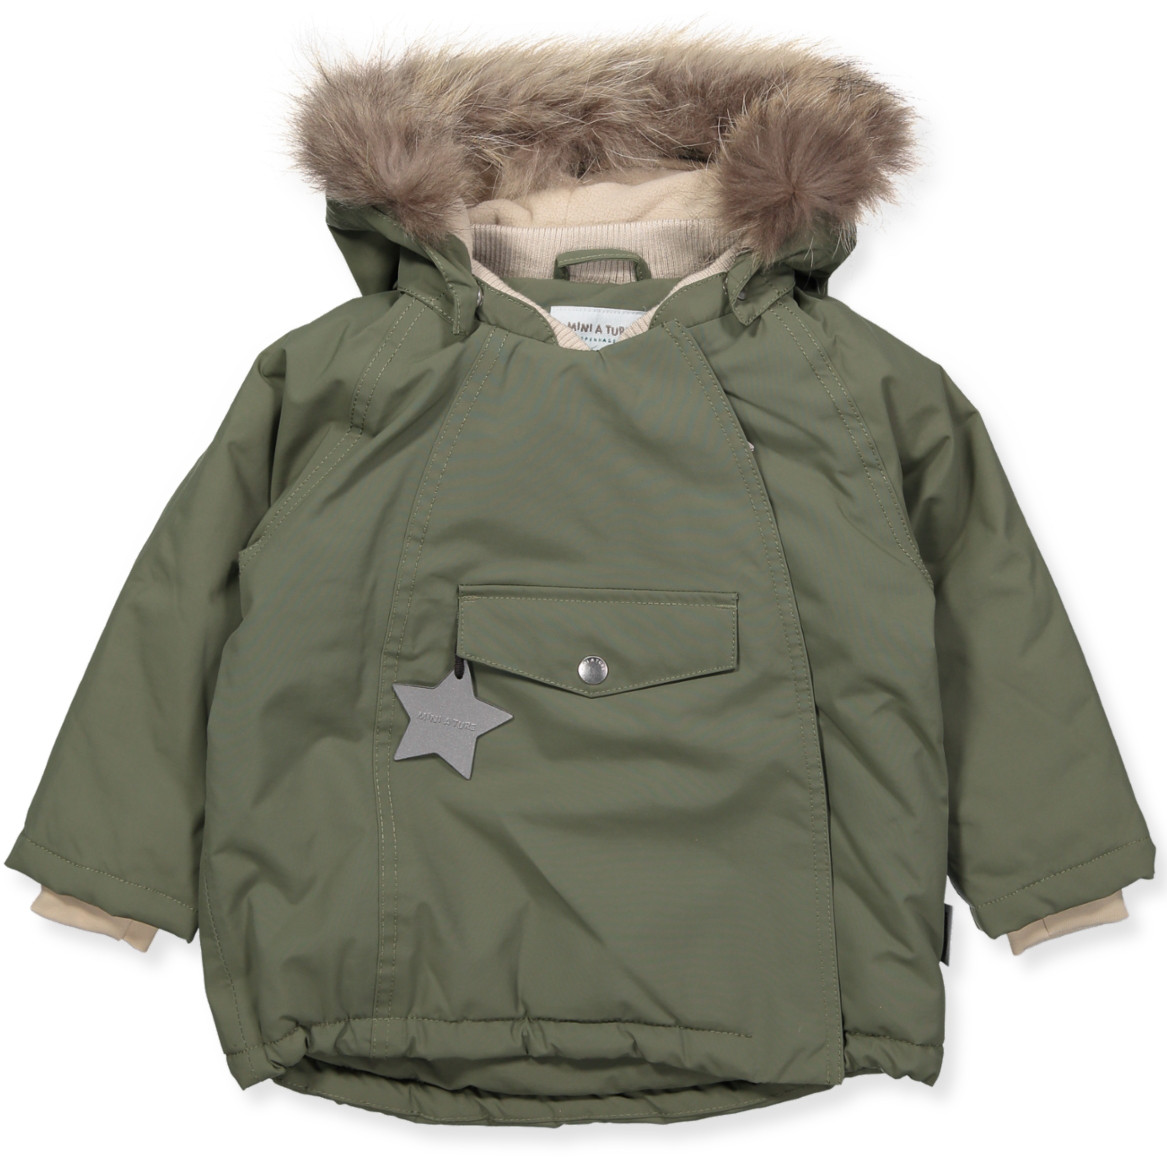 e6b53296 Mini A Ture - Wang vinterjakke med pels - Clover Green